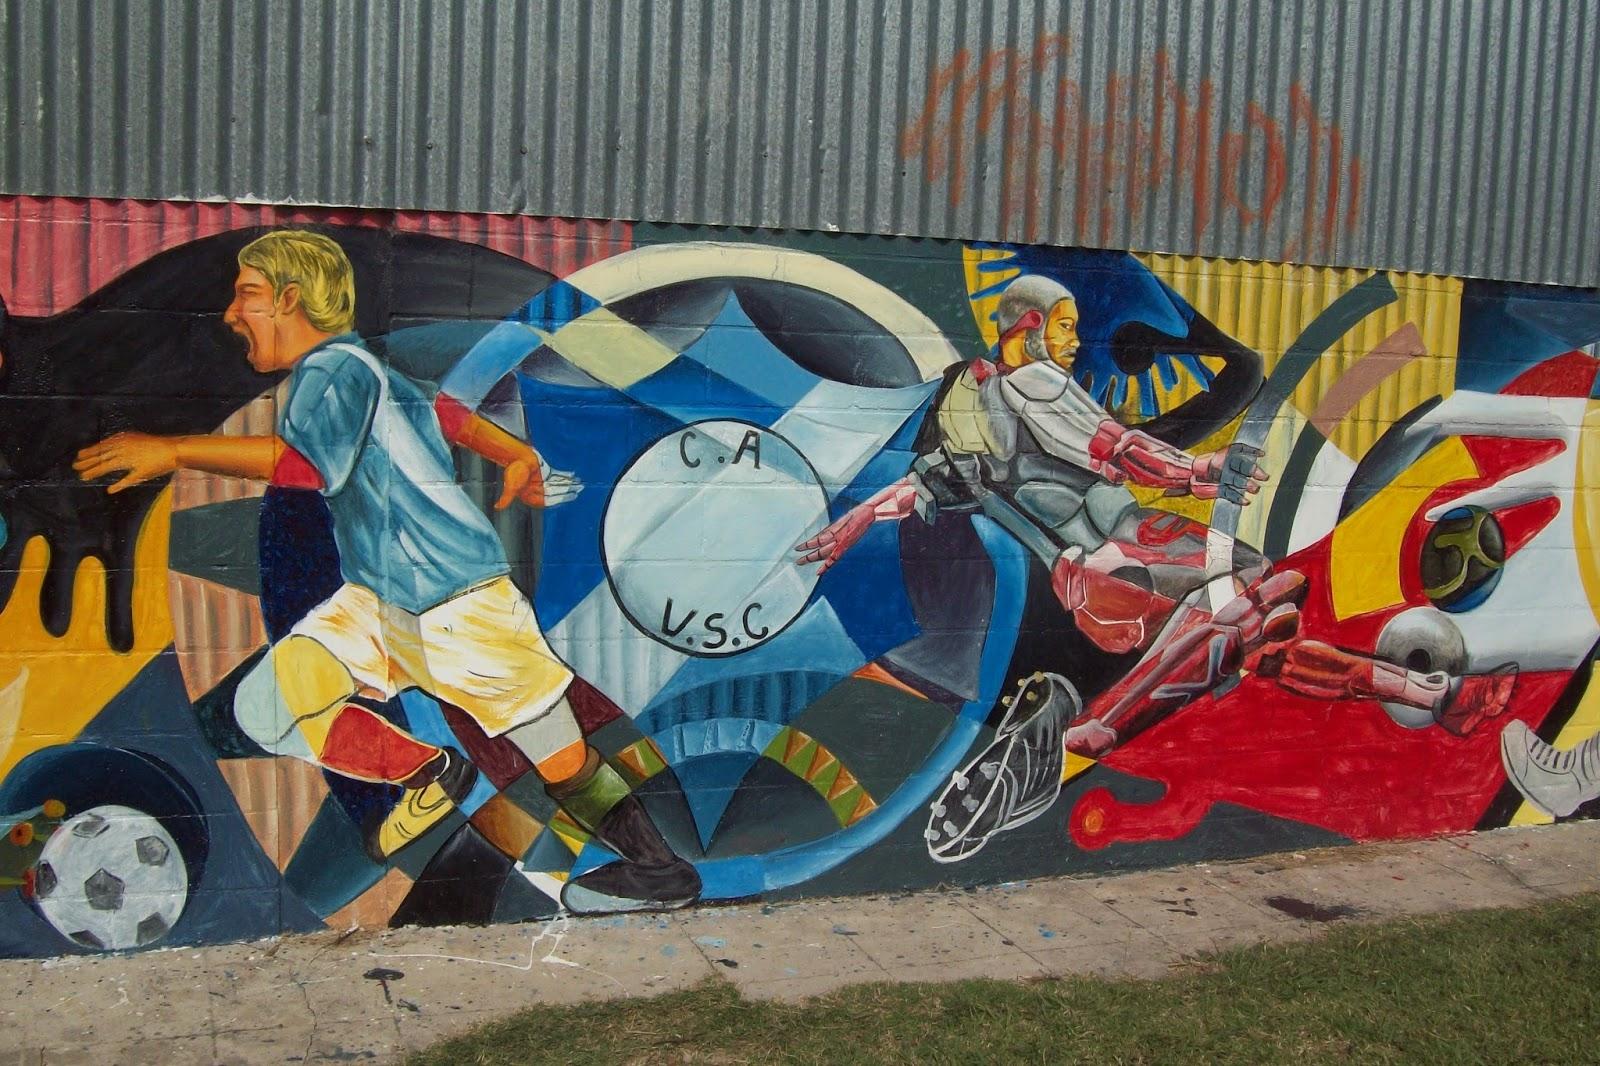 Taller de muralismo apuntes muralismo y arte mural for Arte mural mexicano